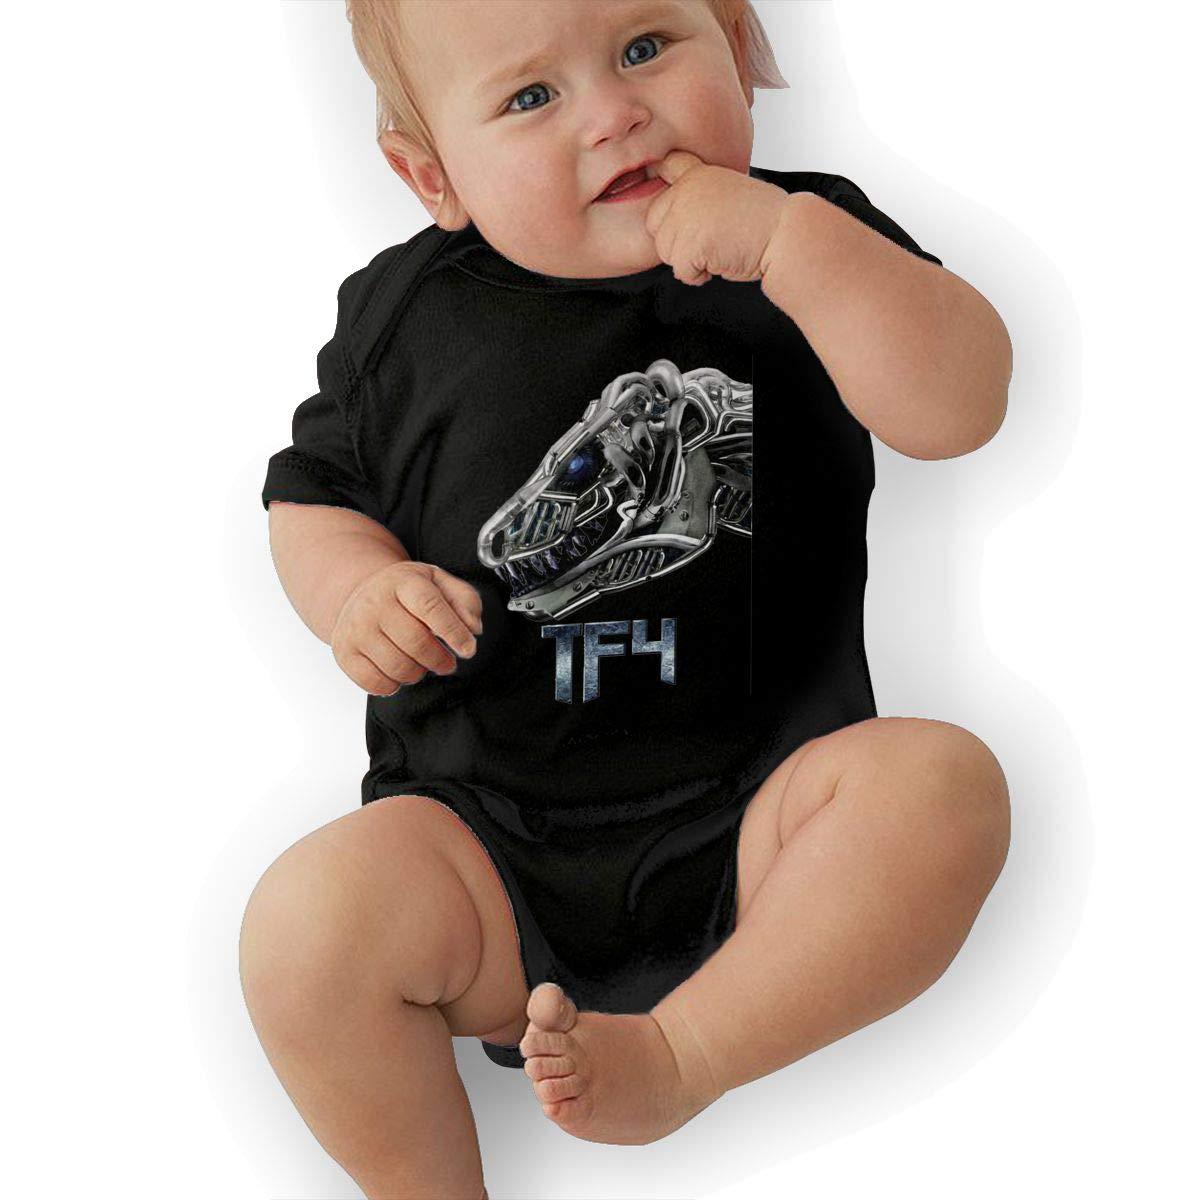 LuckyTagy Transformers Age of Extinction Unisex Fashion Boys /& Girls Romper Baby BoyBodysuit Black